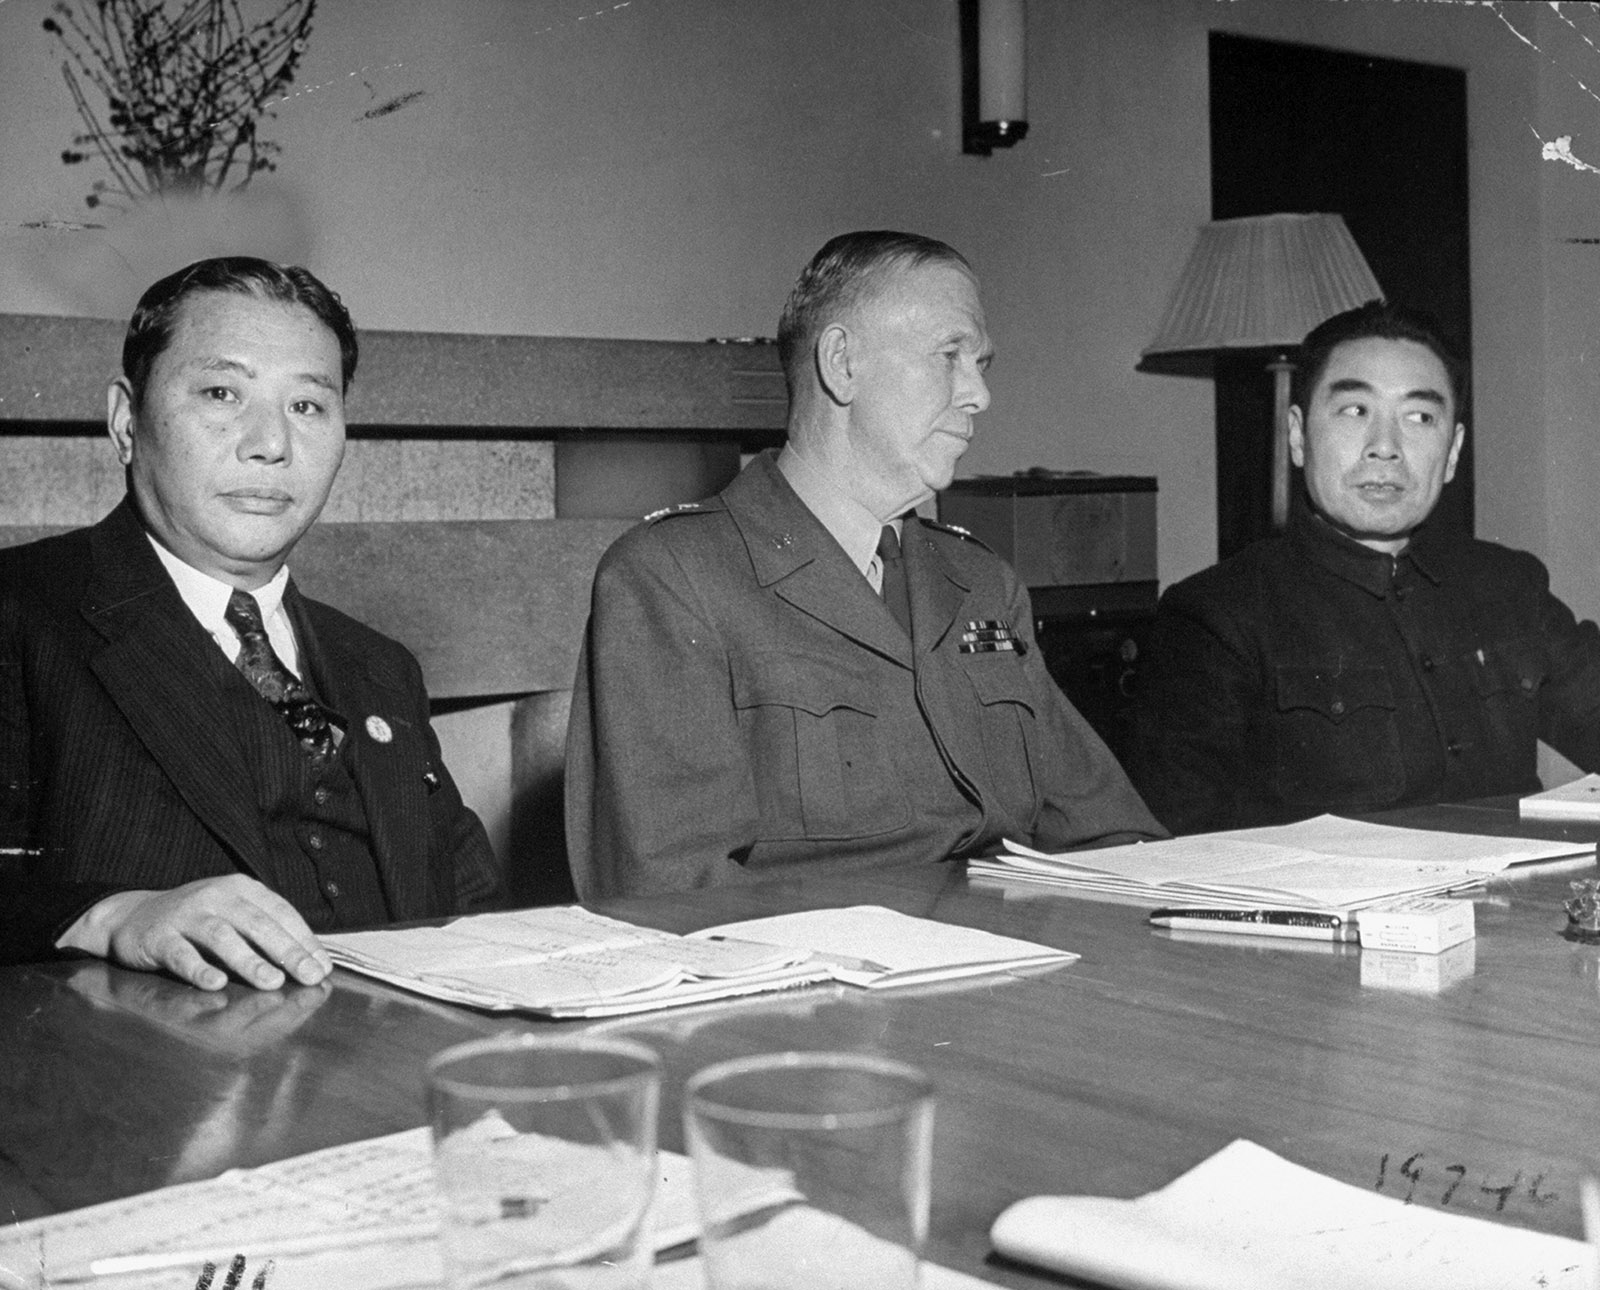 General George C. Marshall meeting with Chang Chun and Zhou Enlai, circa 1946